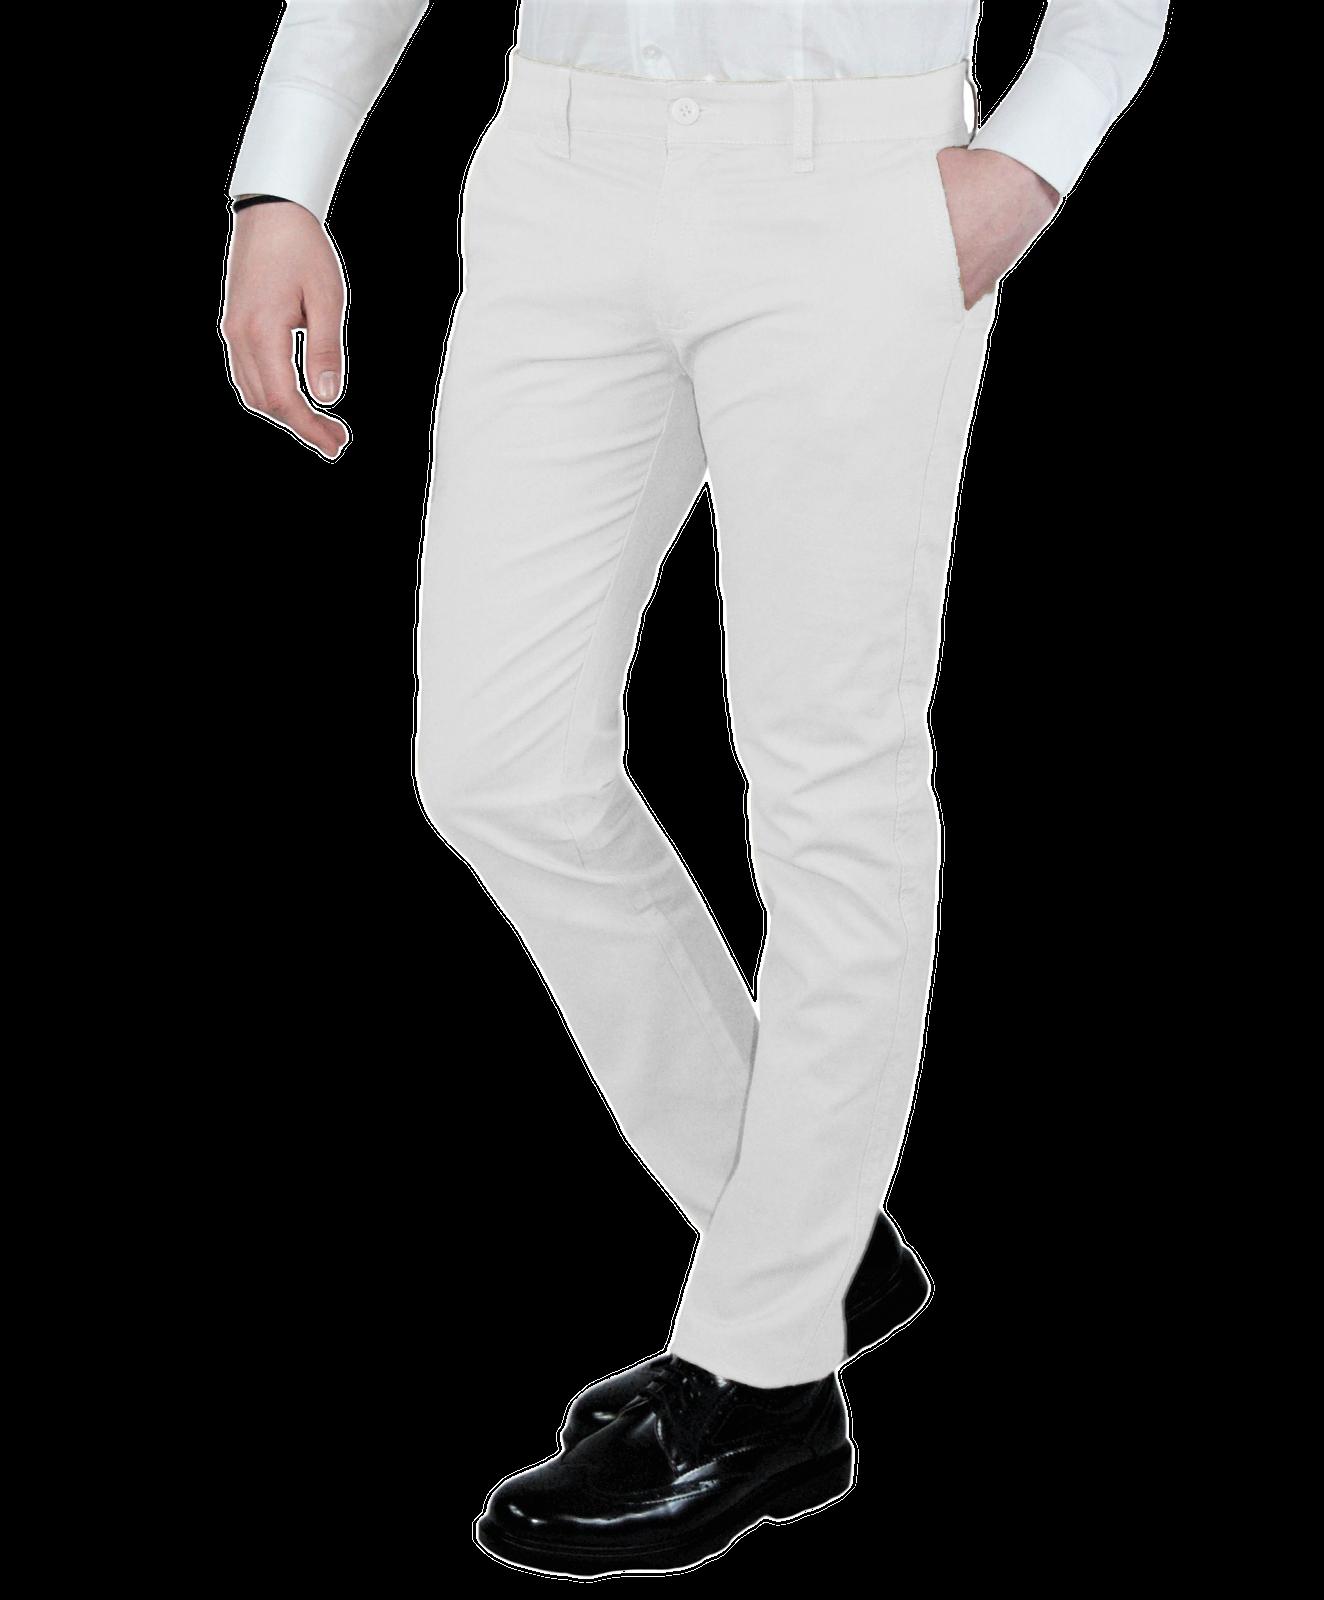 Pantalone-Uomo-Chino-Slim-fit-Primaverile-tasca-america-Bianco-Grigio-Senape-Bei miniatura 15